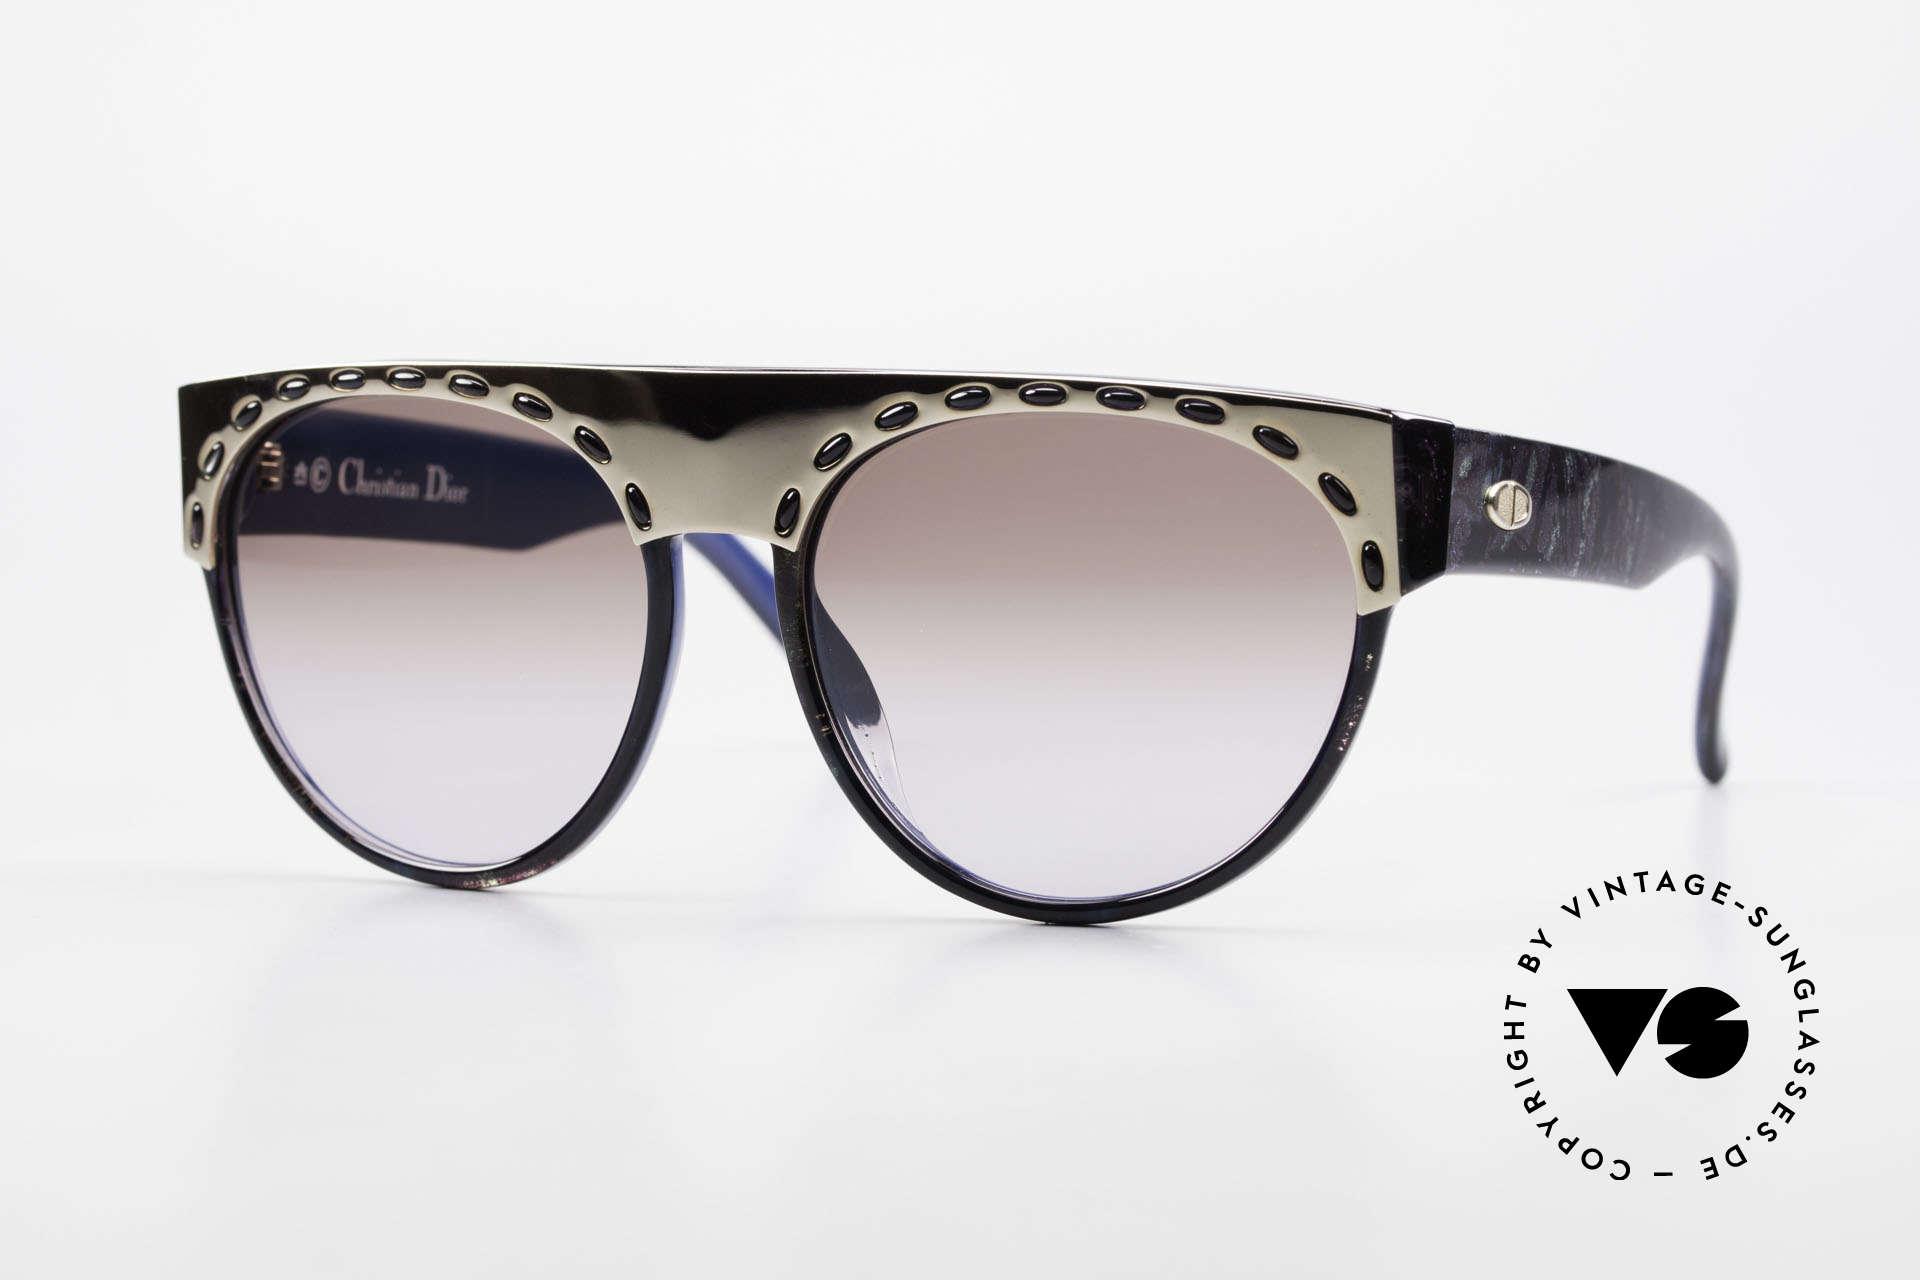 Christian Dior 2437 Vintage Ladies Sunglasses 80's, superb sunglasses by Christian Dior from the late 80's, Made for Women